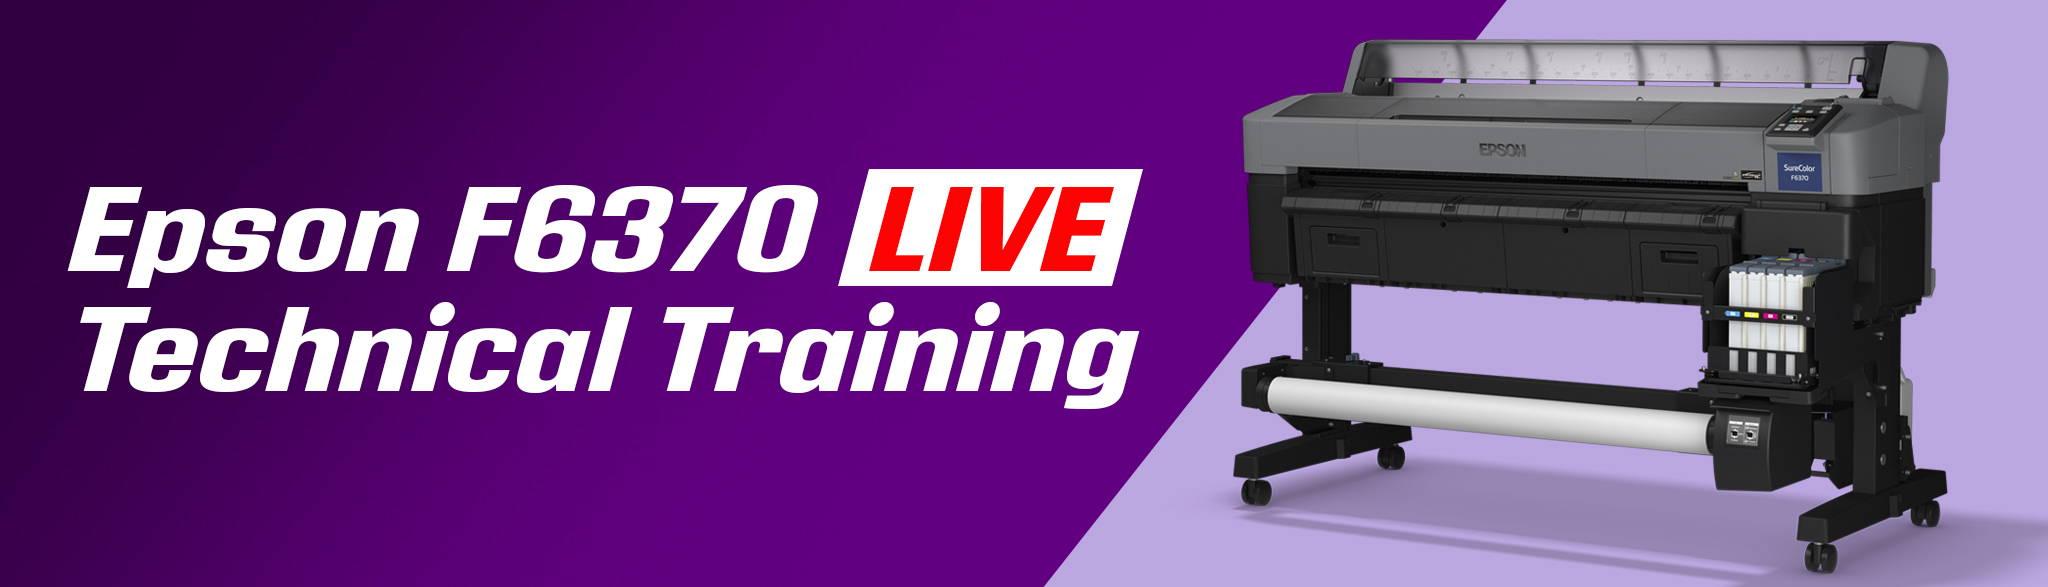 Epson F2100 Live Technical Training